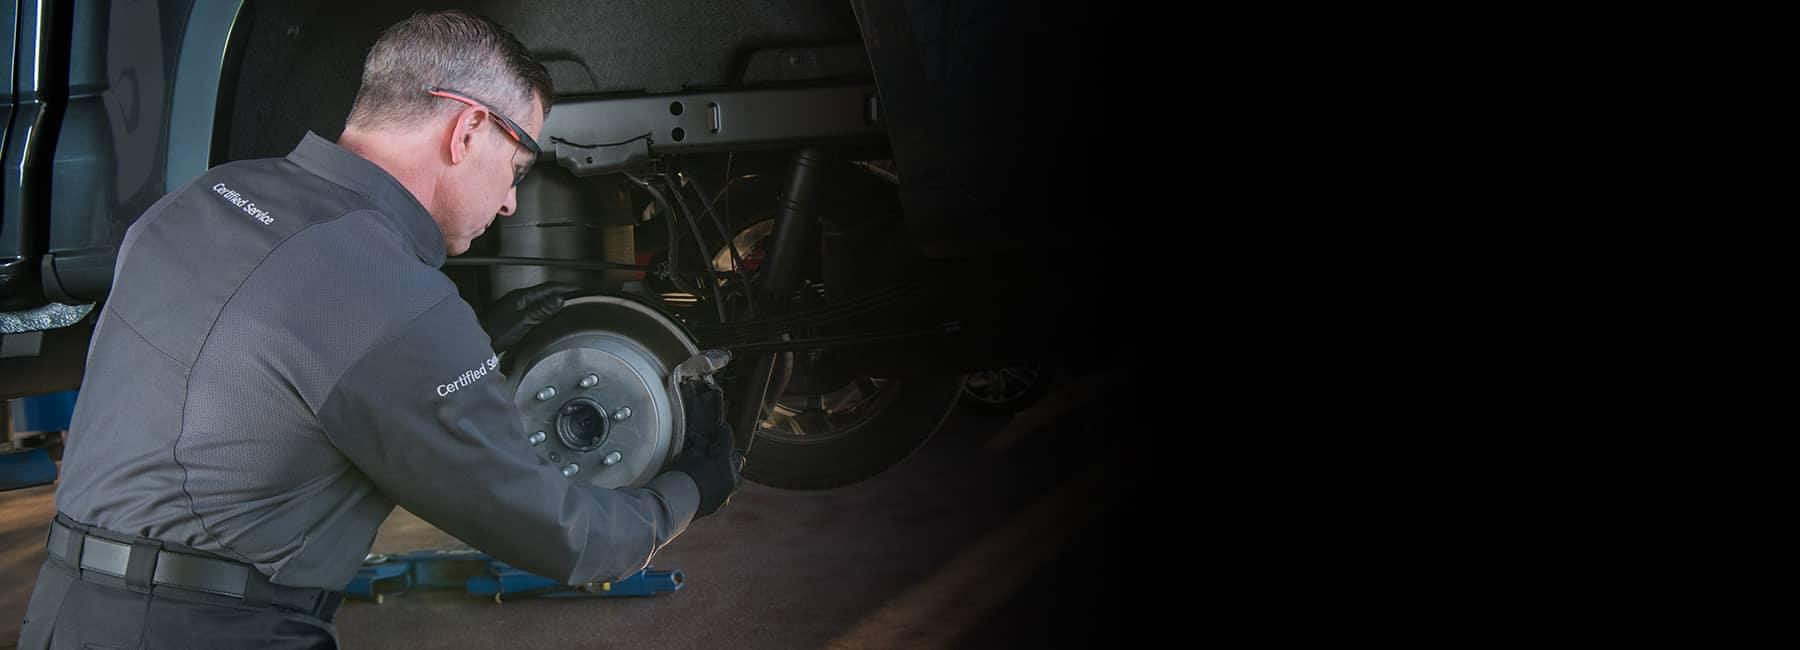 GM Certified Service Technician Replacing Rotors